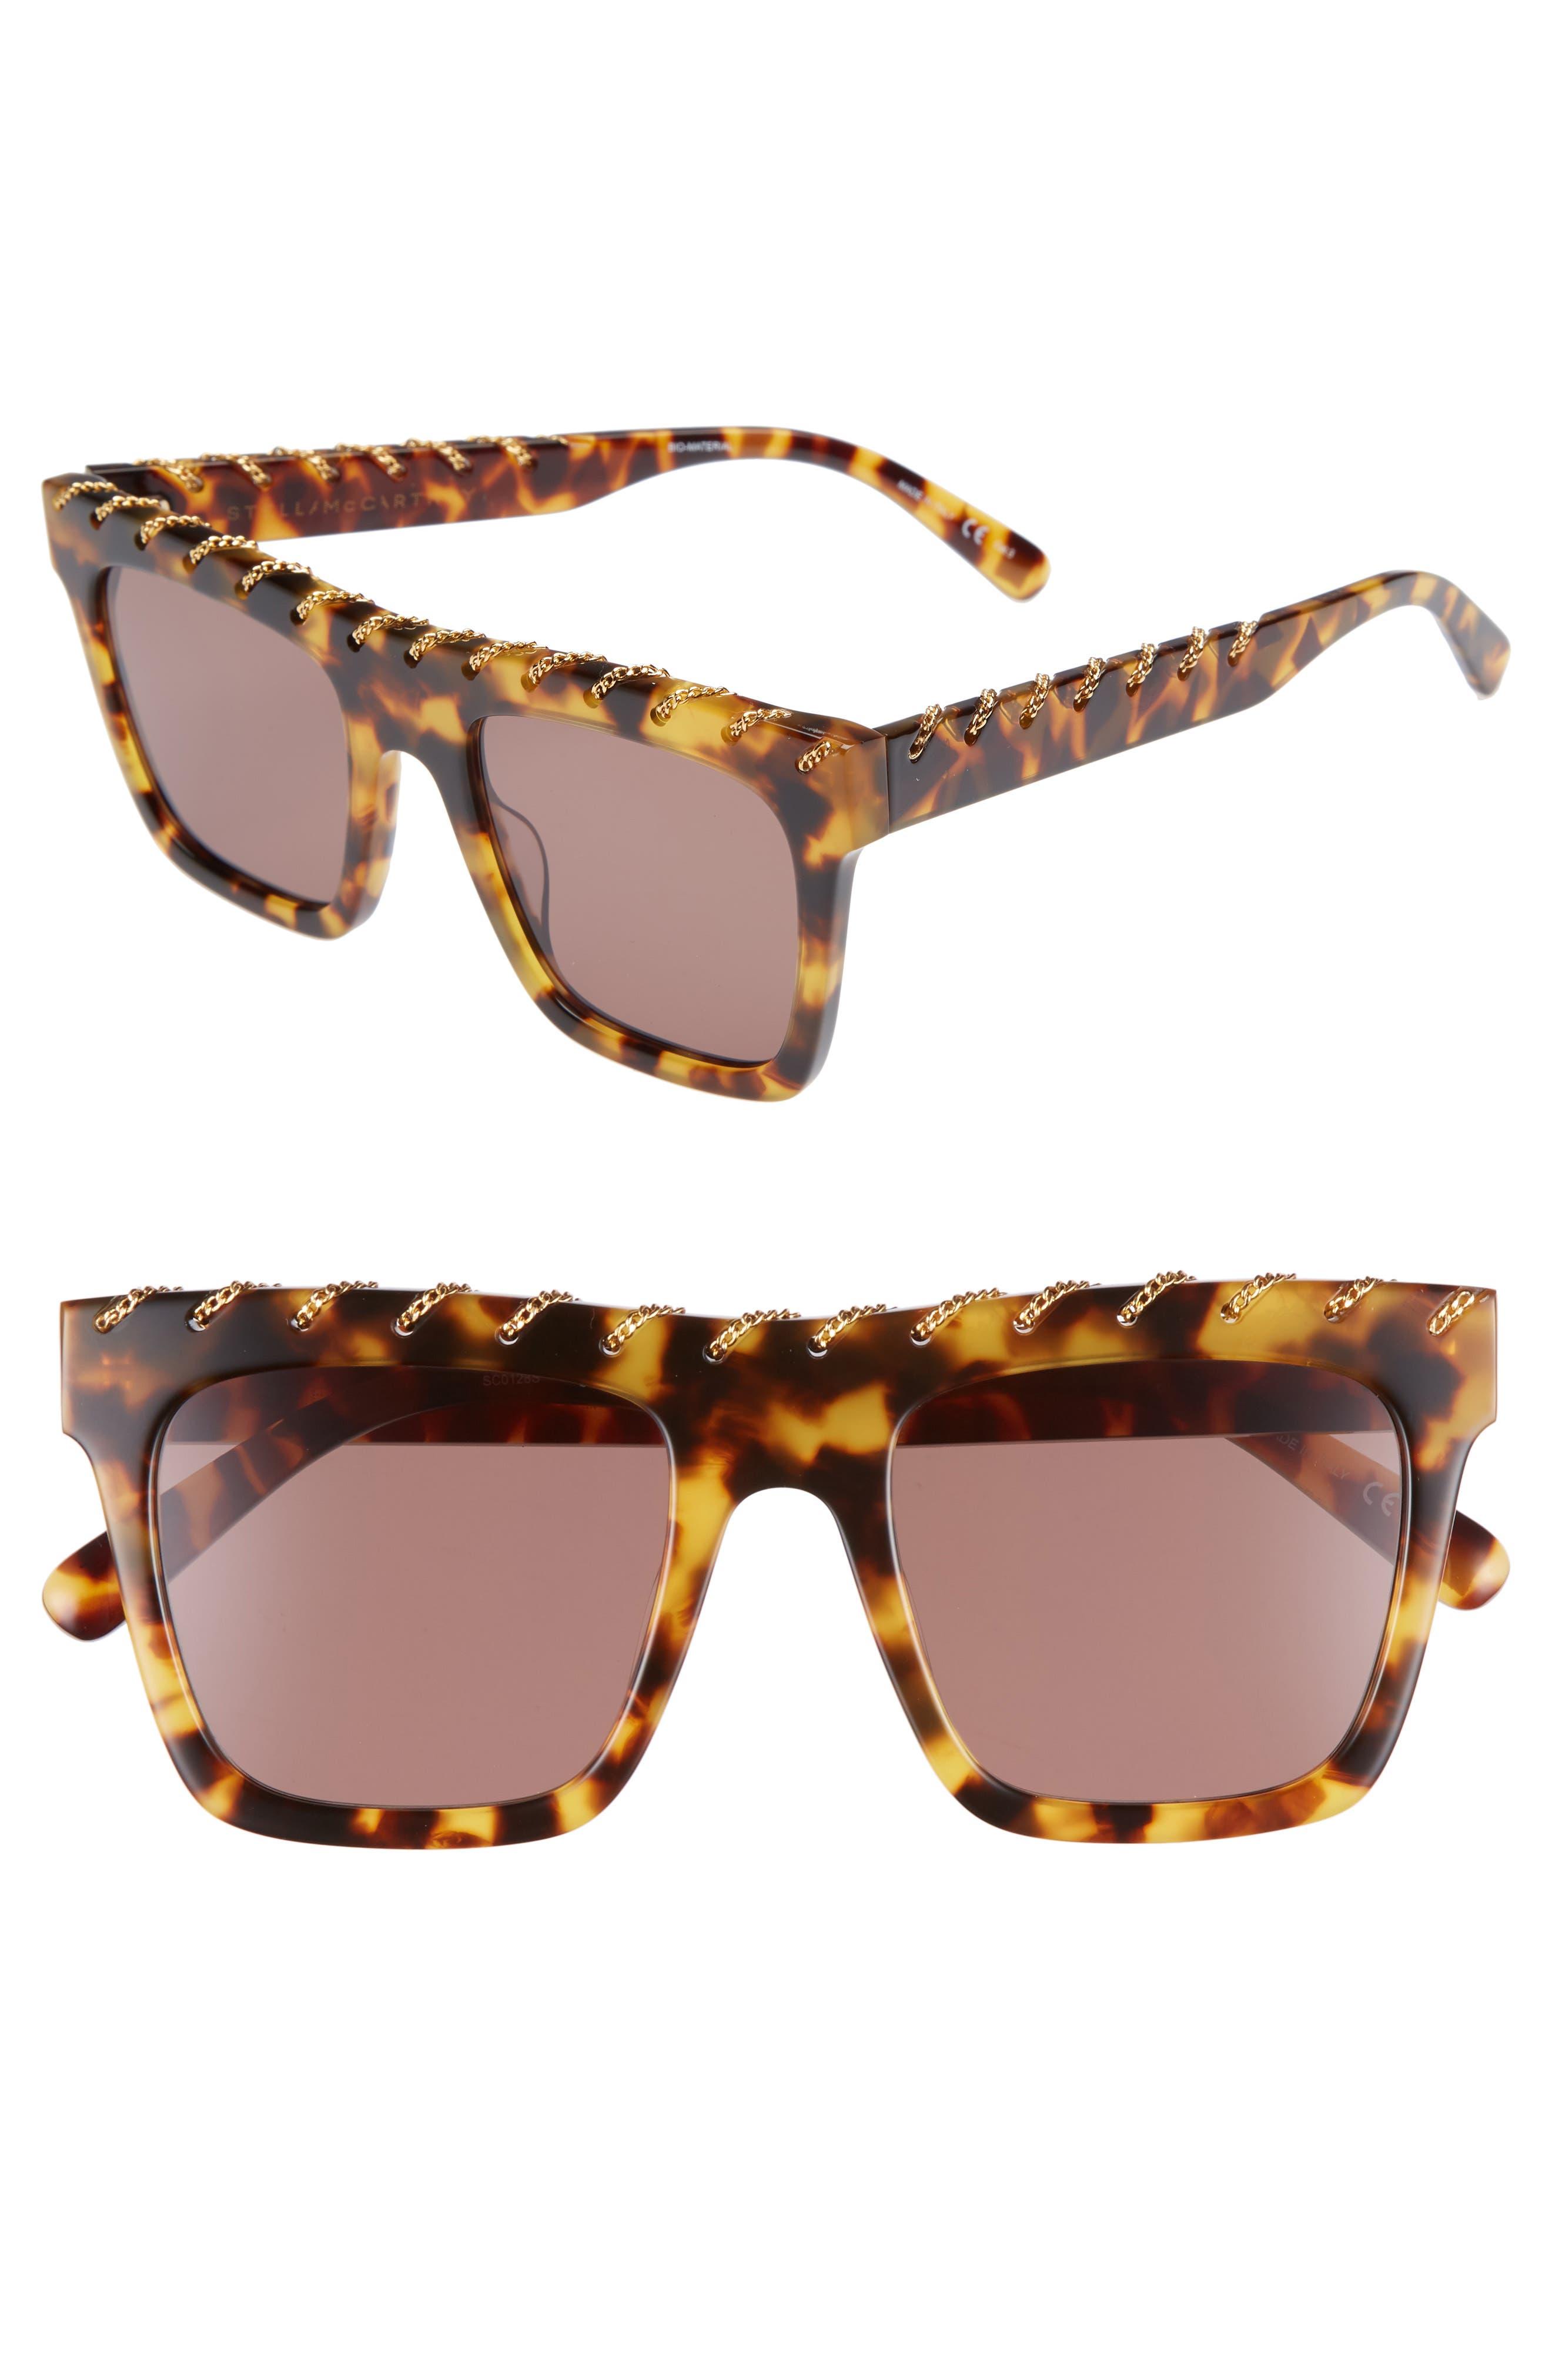 51mm Chain Detail Square Sunglasses,                         Main,                         color, Medium Havana/ Gold